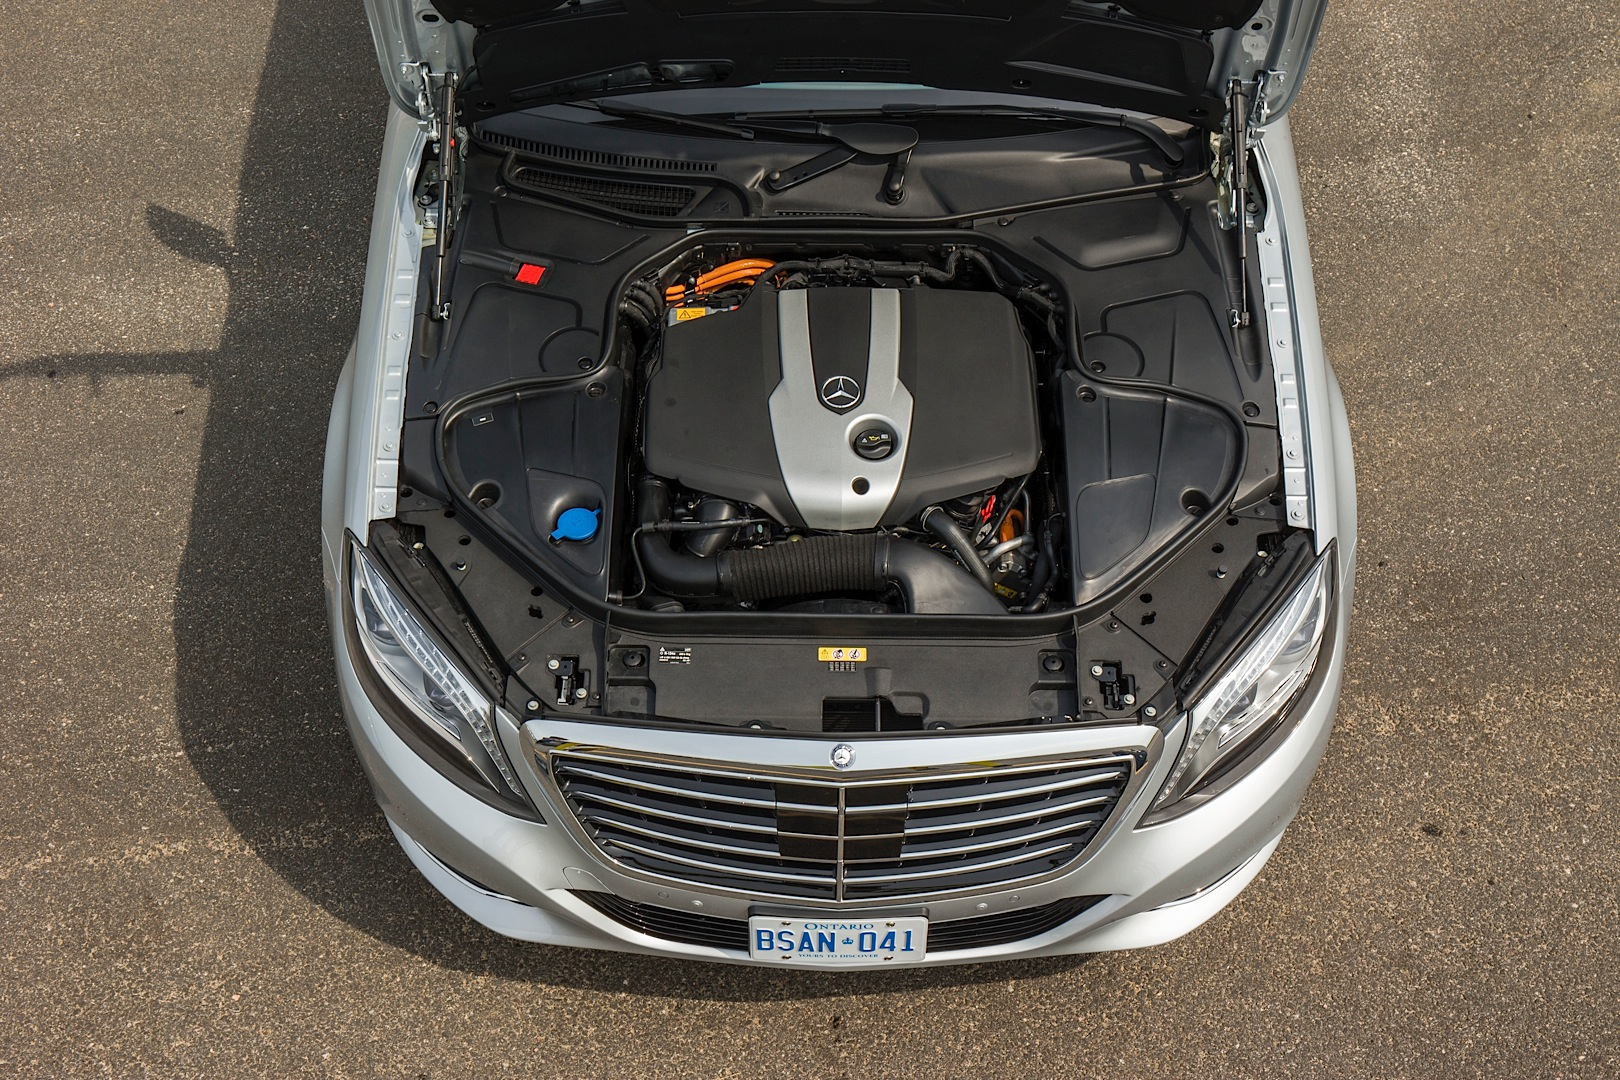 mercedes benz 39 s engine encapsulation saves fuel autoevolution. Black Bedroom Furniture Sets. Home Design Ideas